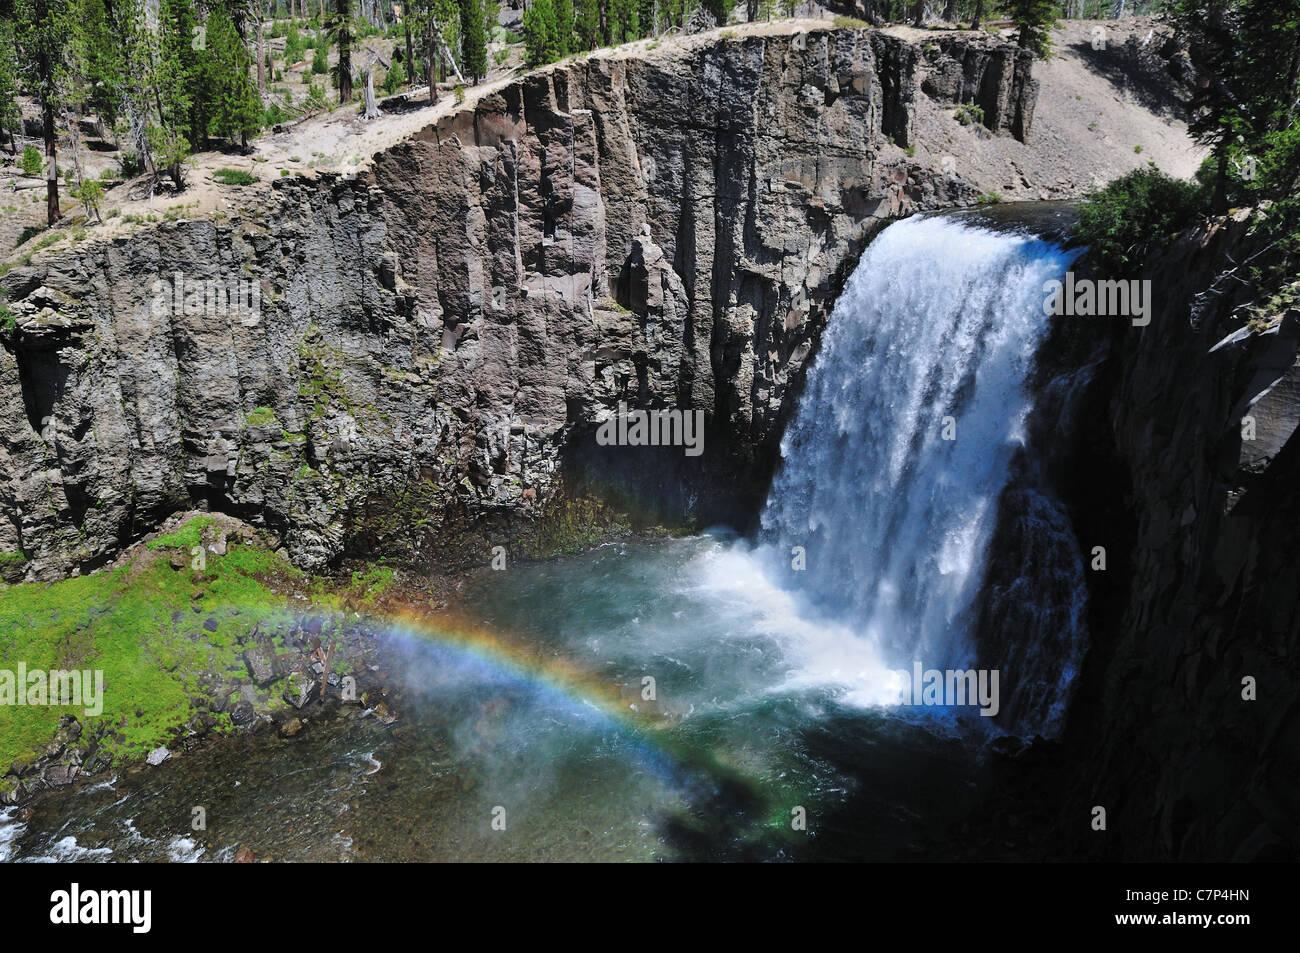 The Rainbow Fall. Devil's Postpile National Monument. California, USA. - Stock Image